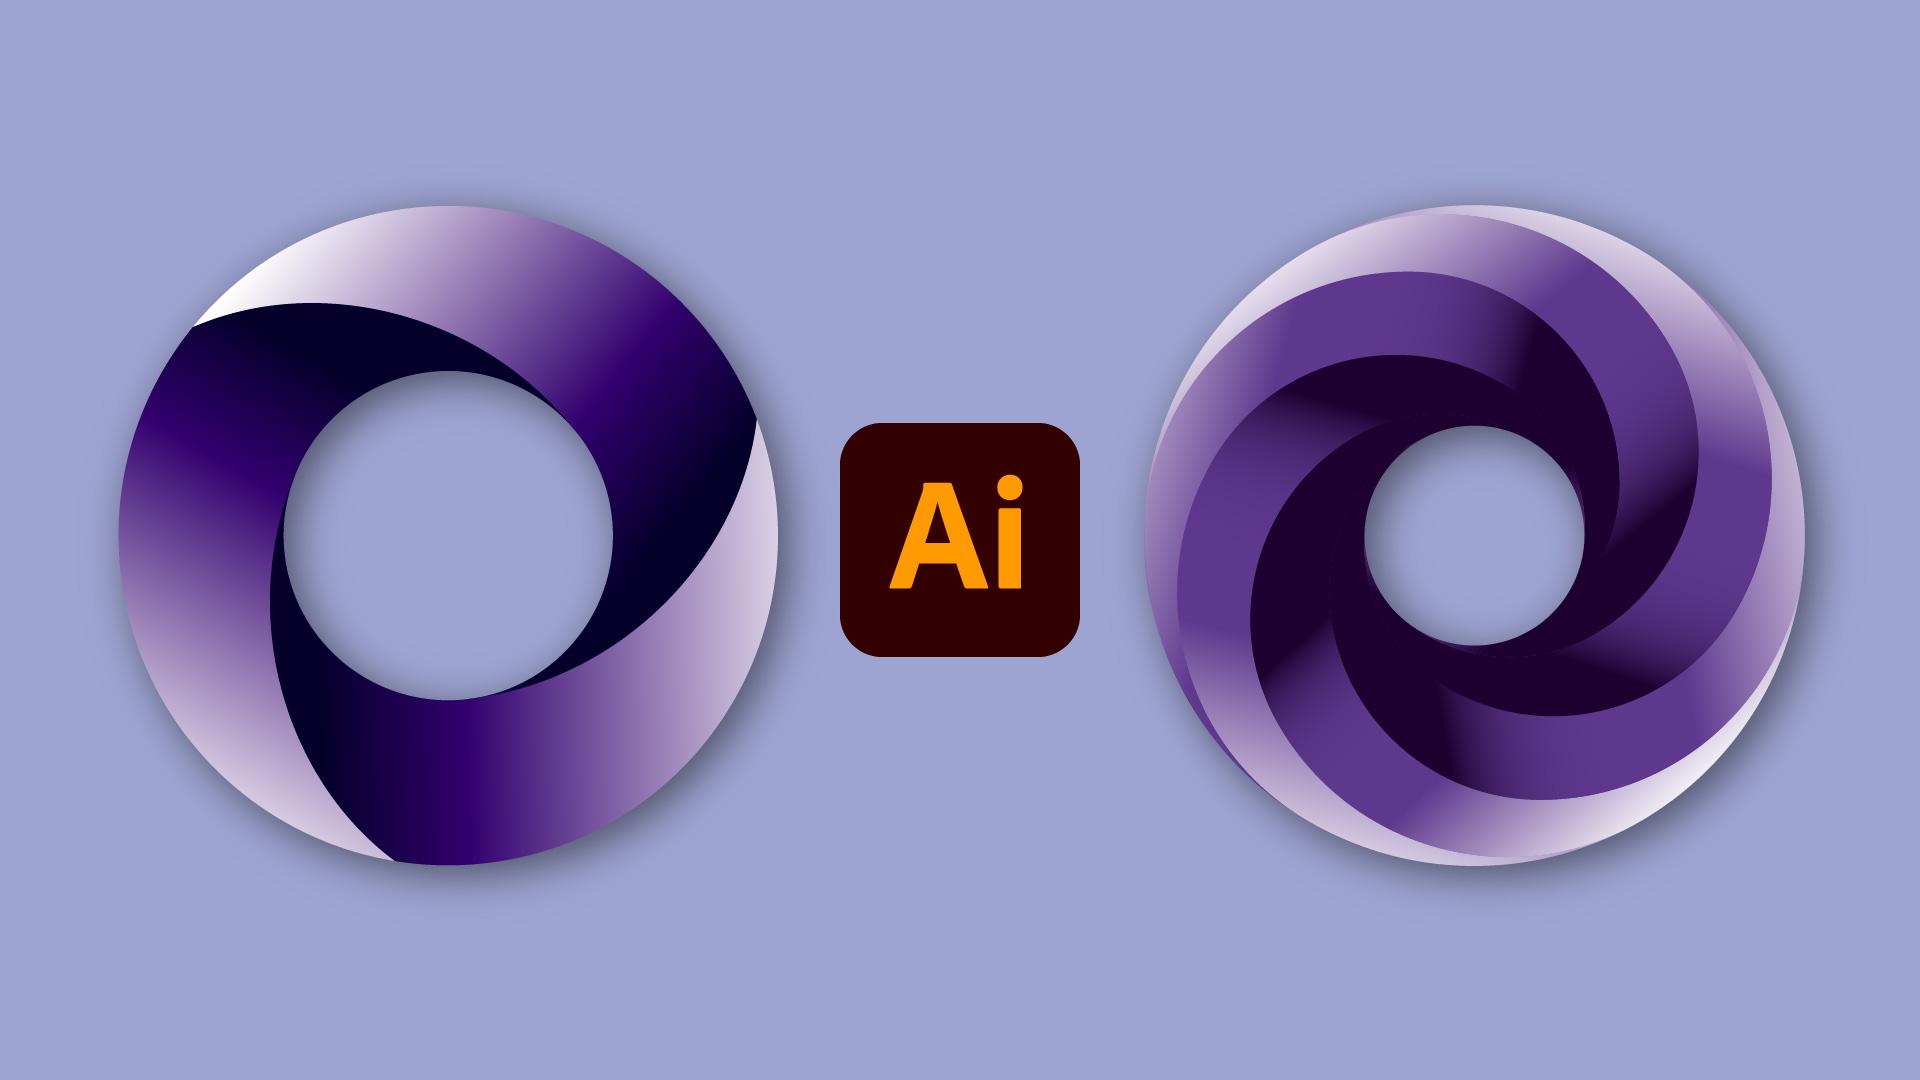 Dégradé ronds logo Illustrator